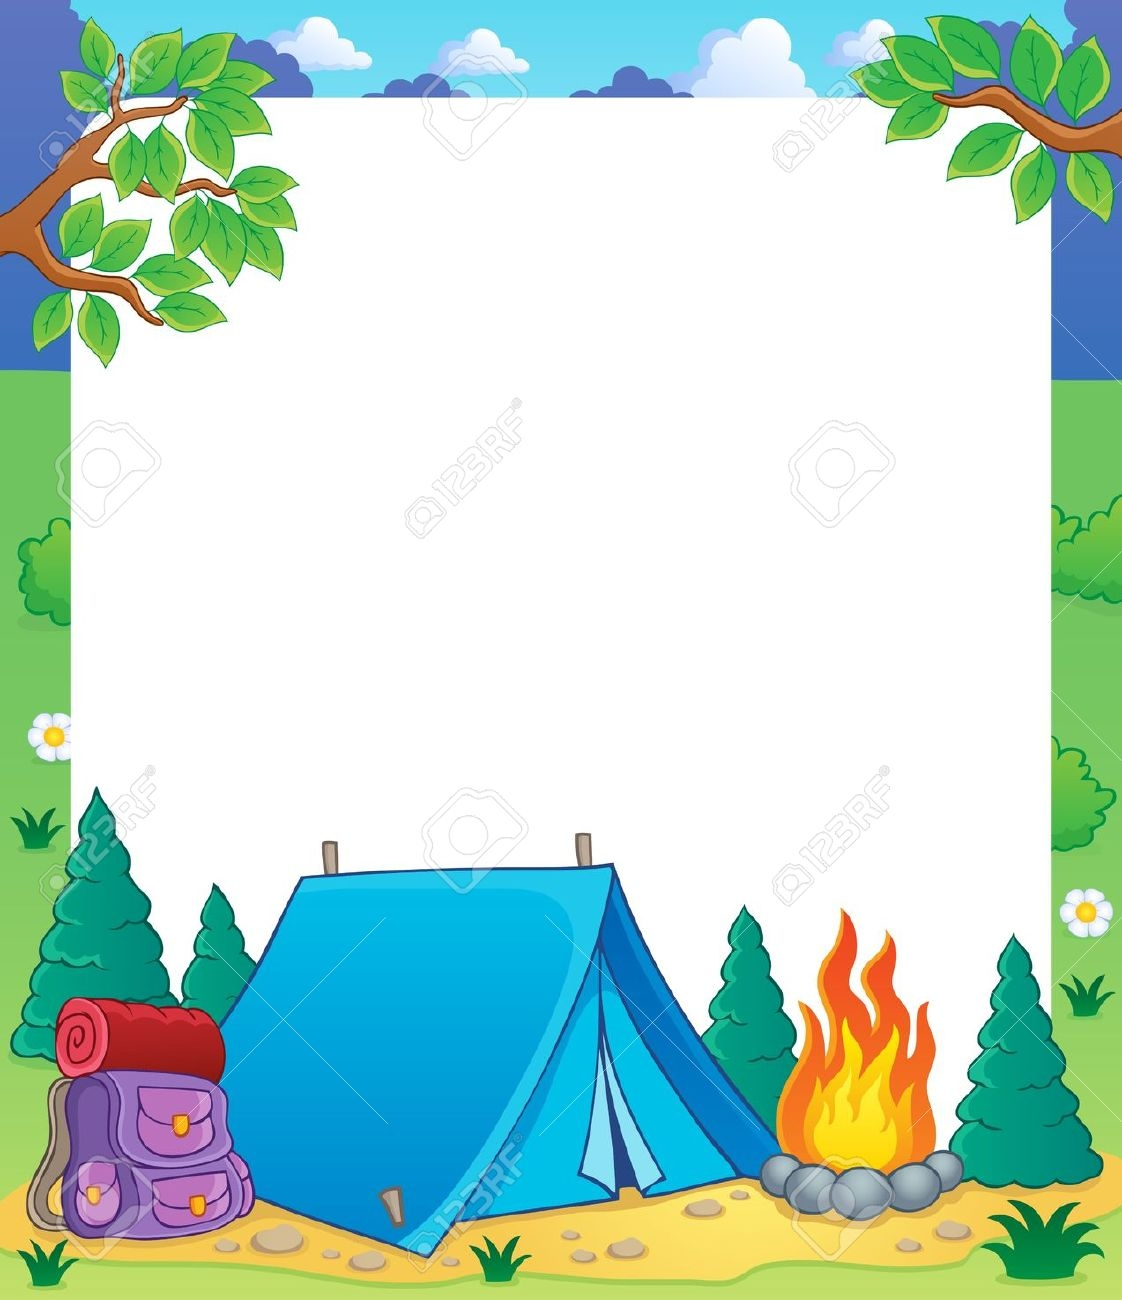 clip art download Free camping clipart borders.  clip art clipartlook.